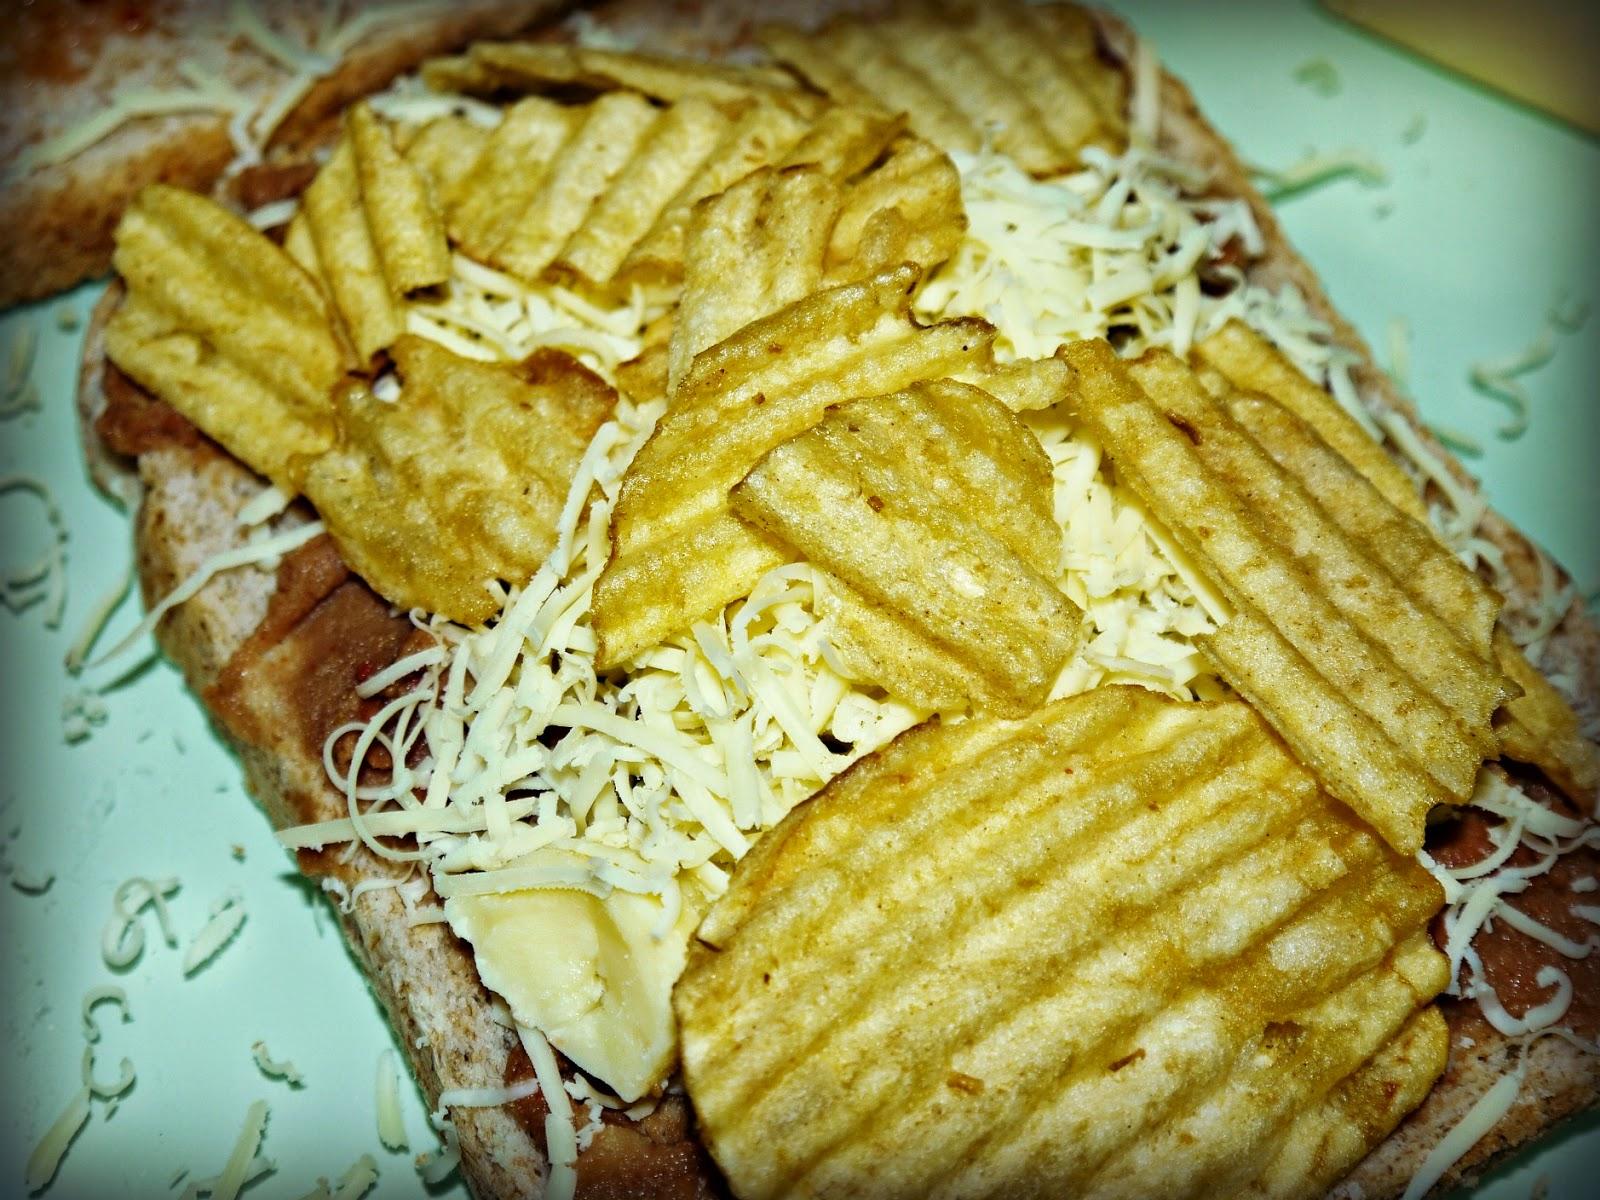 sandwich, cheese, crisps